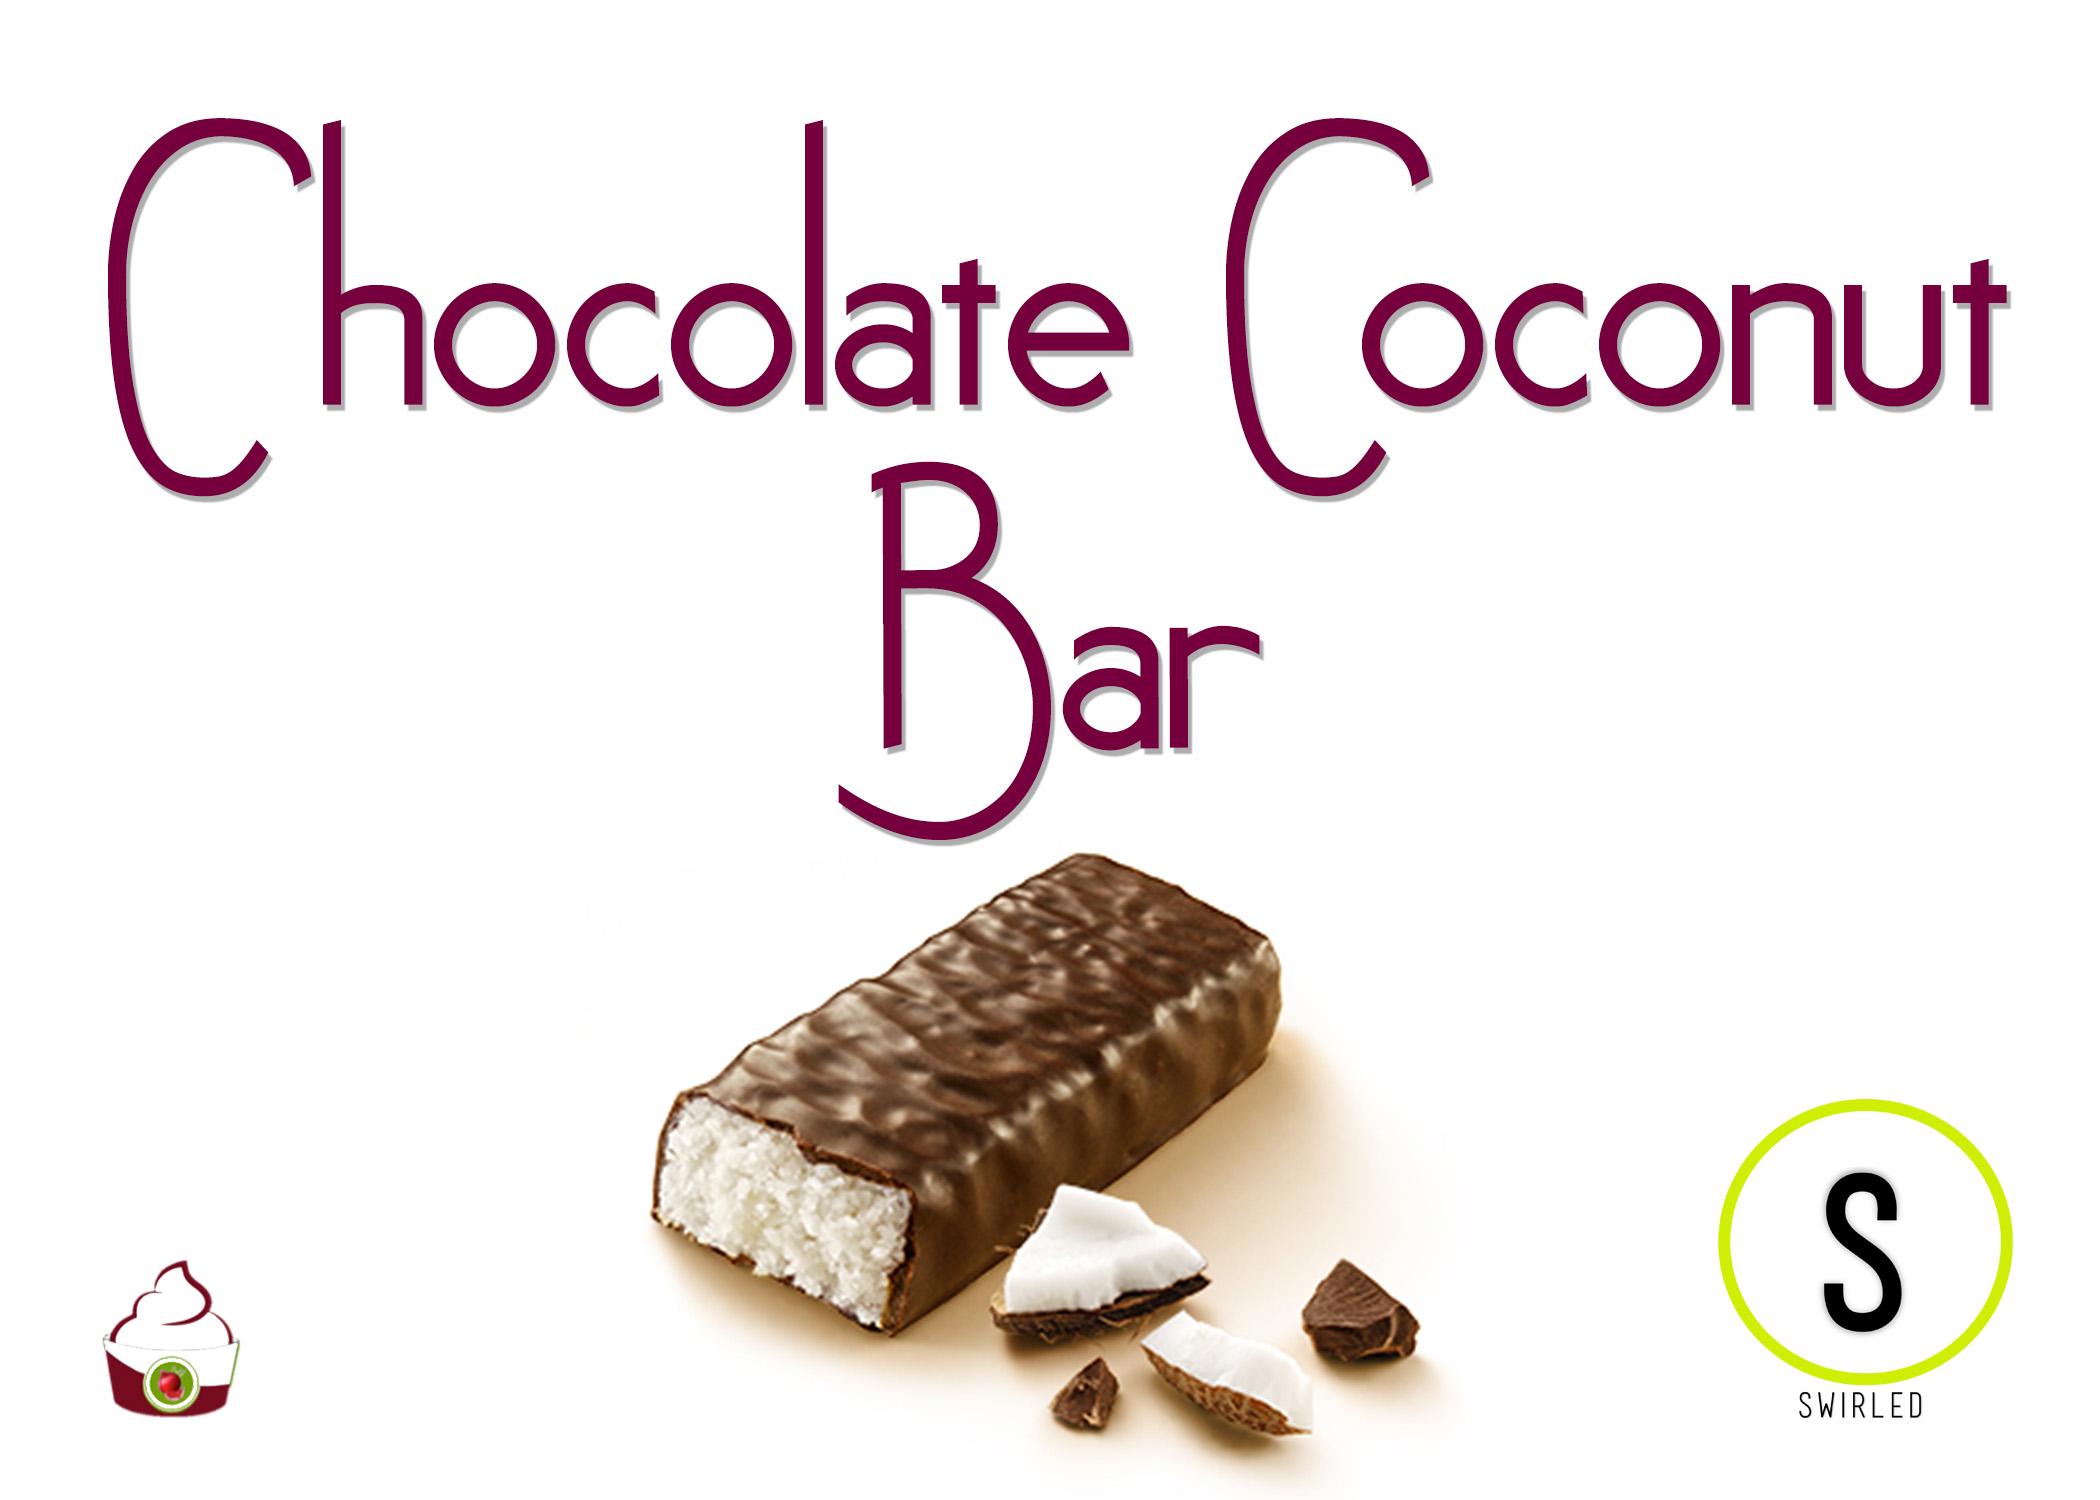 chocolate coconut bar.jpg